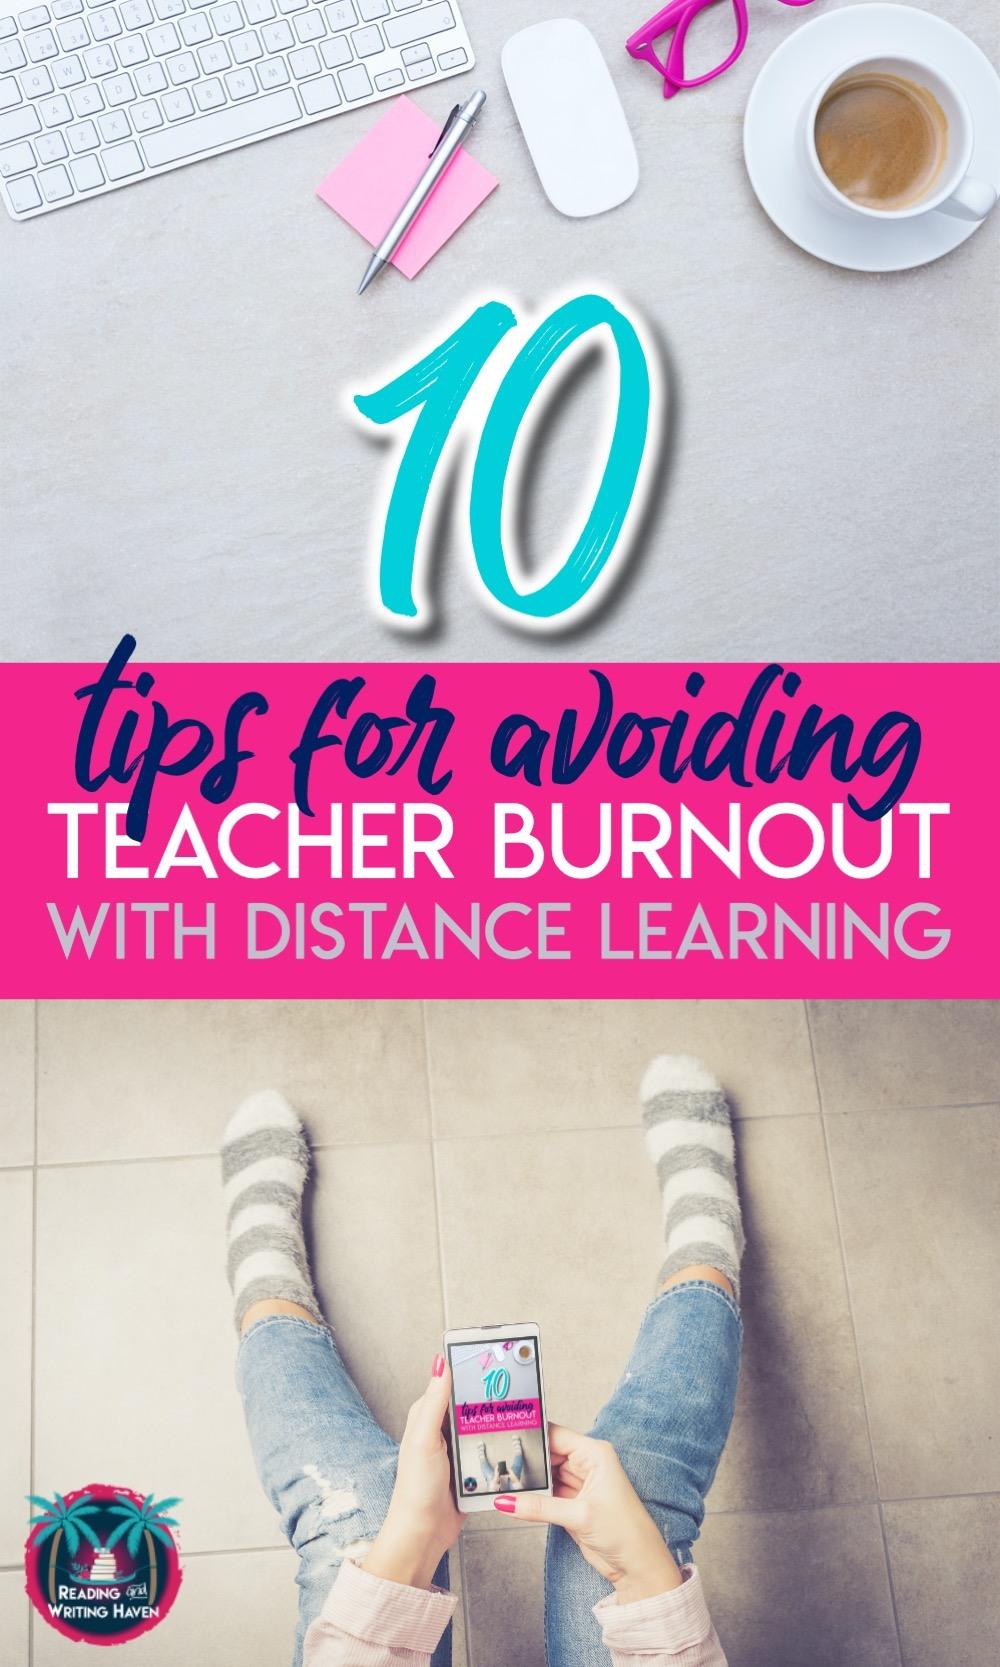 10 strategies for avoiding teacher burnout with distance learning #DistanceLearning #TeacherBurnout